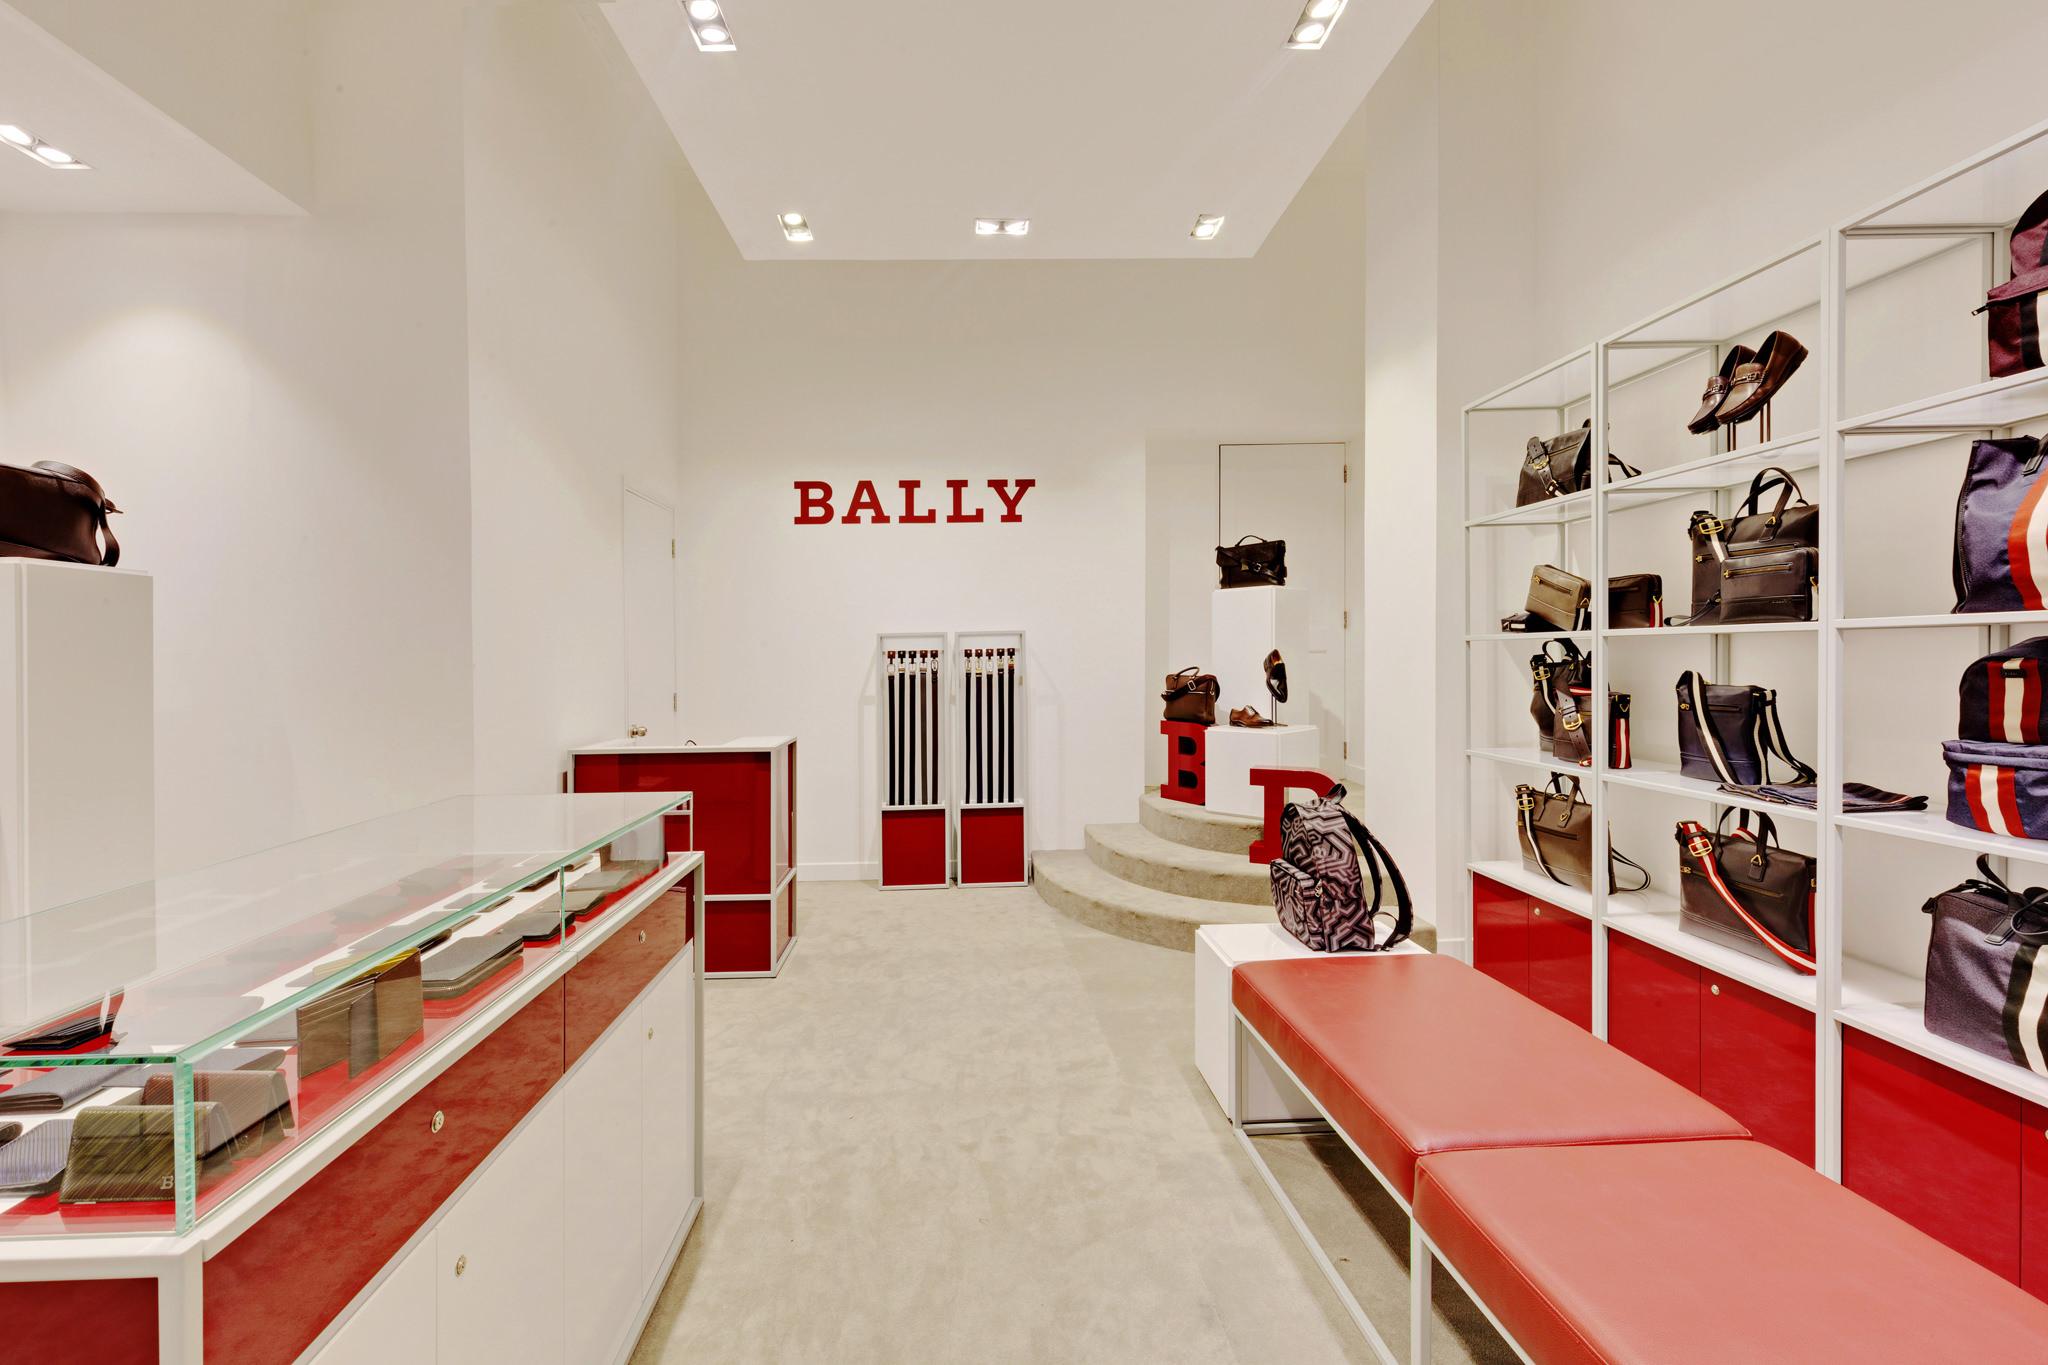 20170316 - Bally - HCM - Commercial - Interior - Store - Retouch 0006.jpg